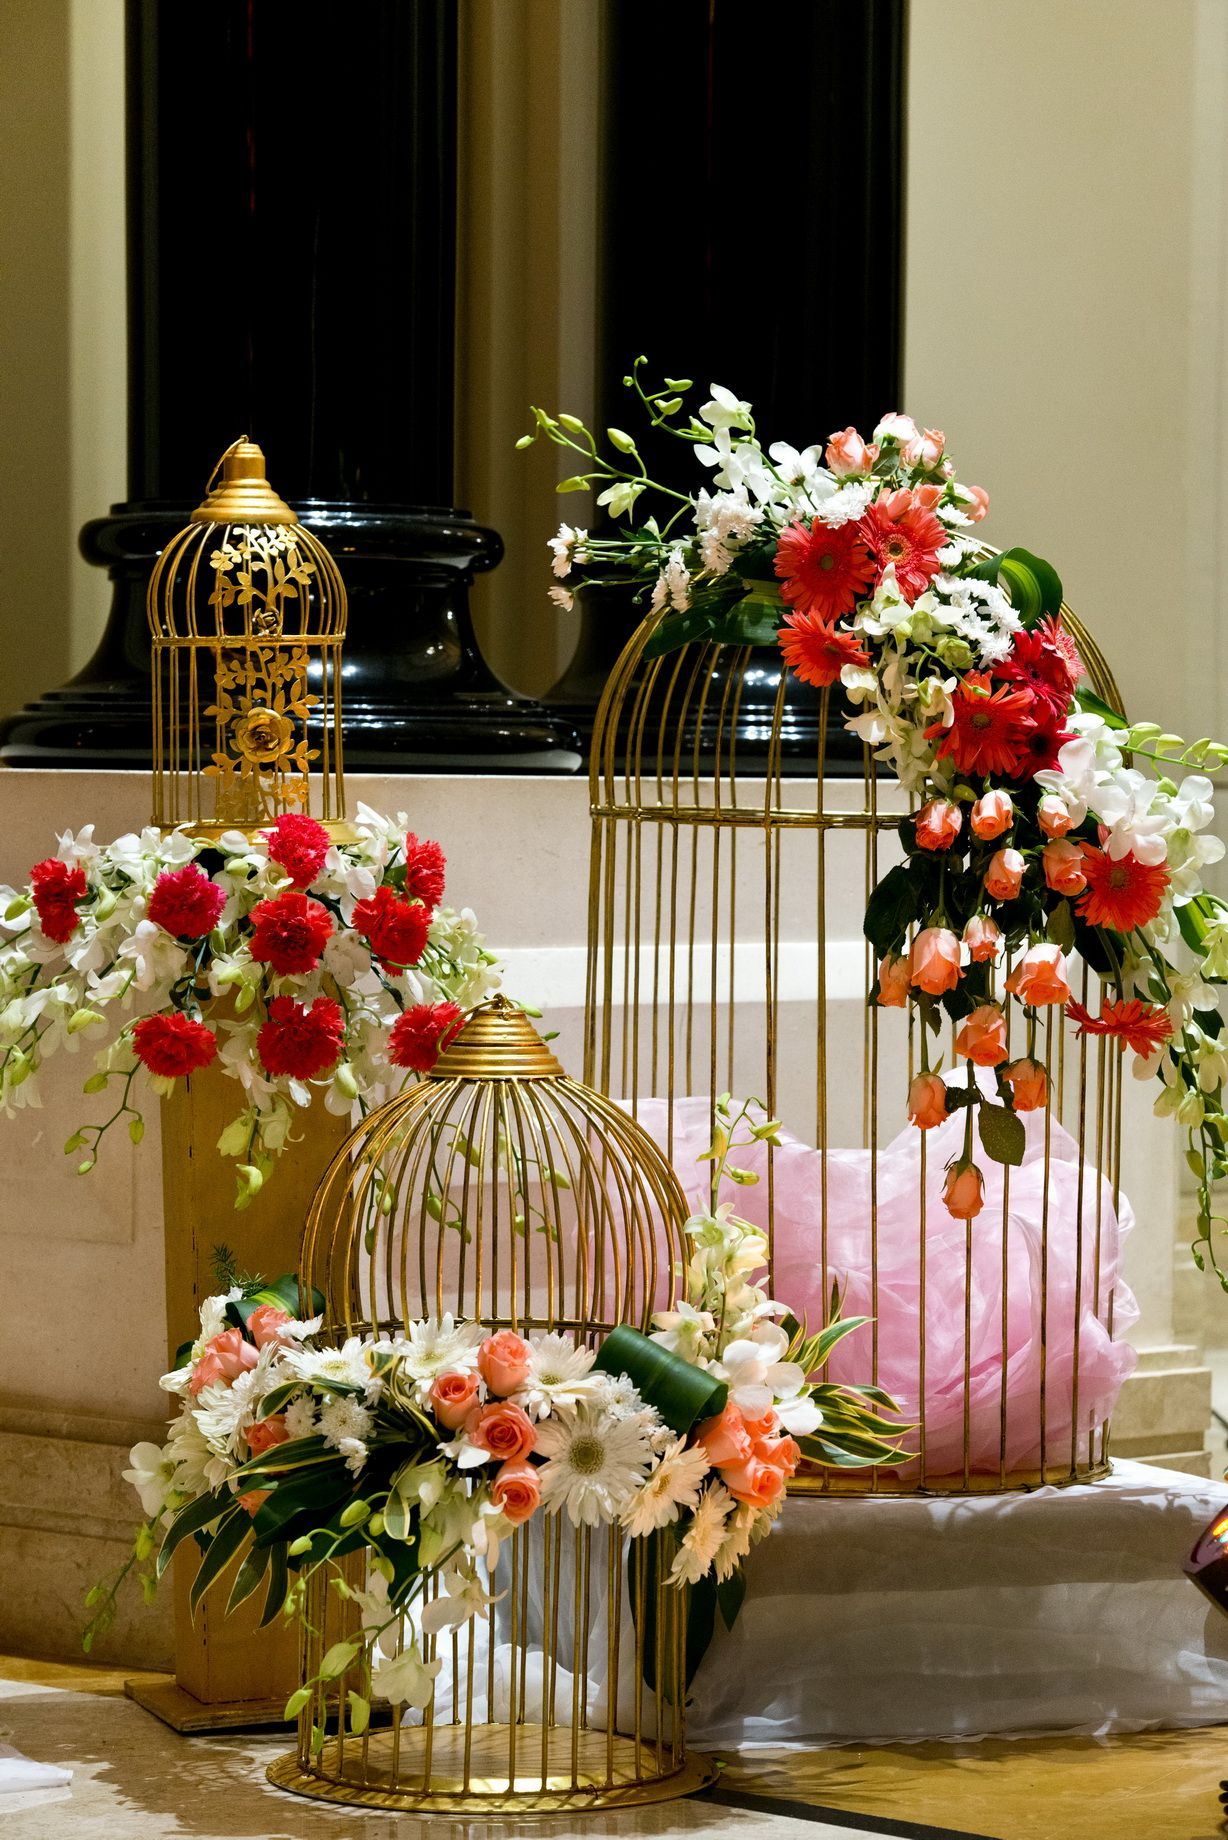 19 Trending DIY Mehndi Decoration Ideas for Mehndi